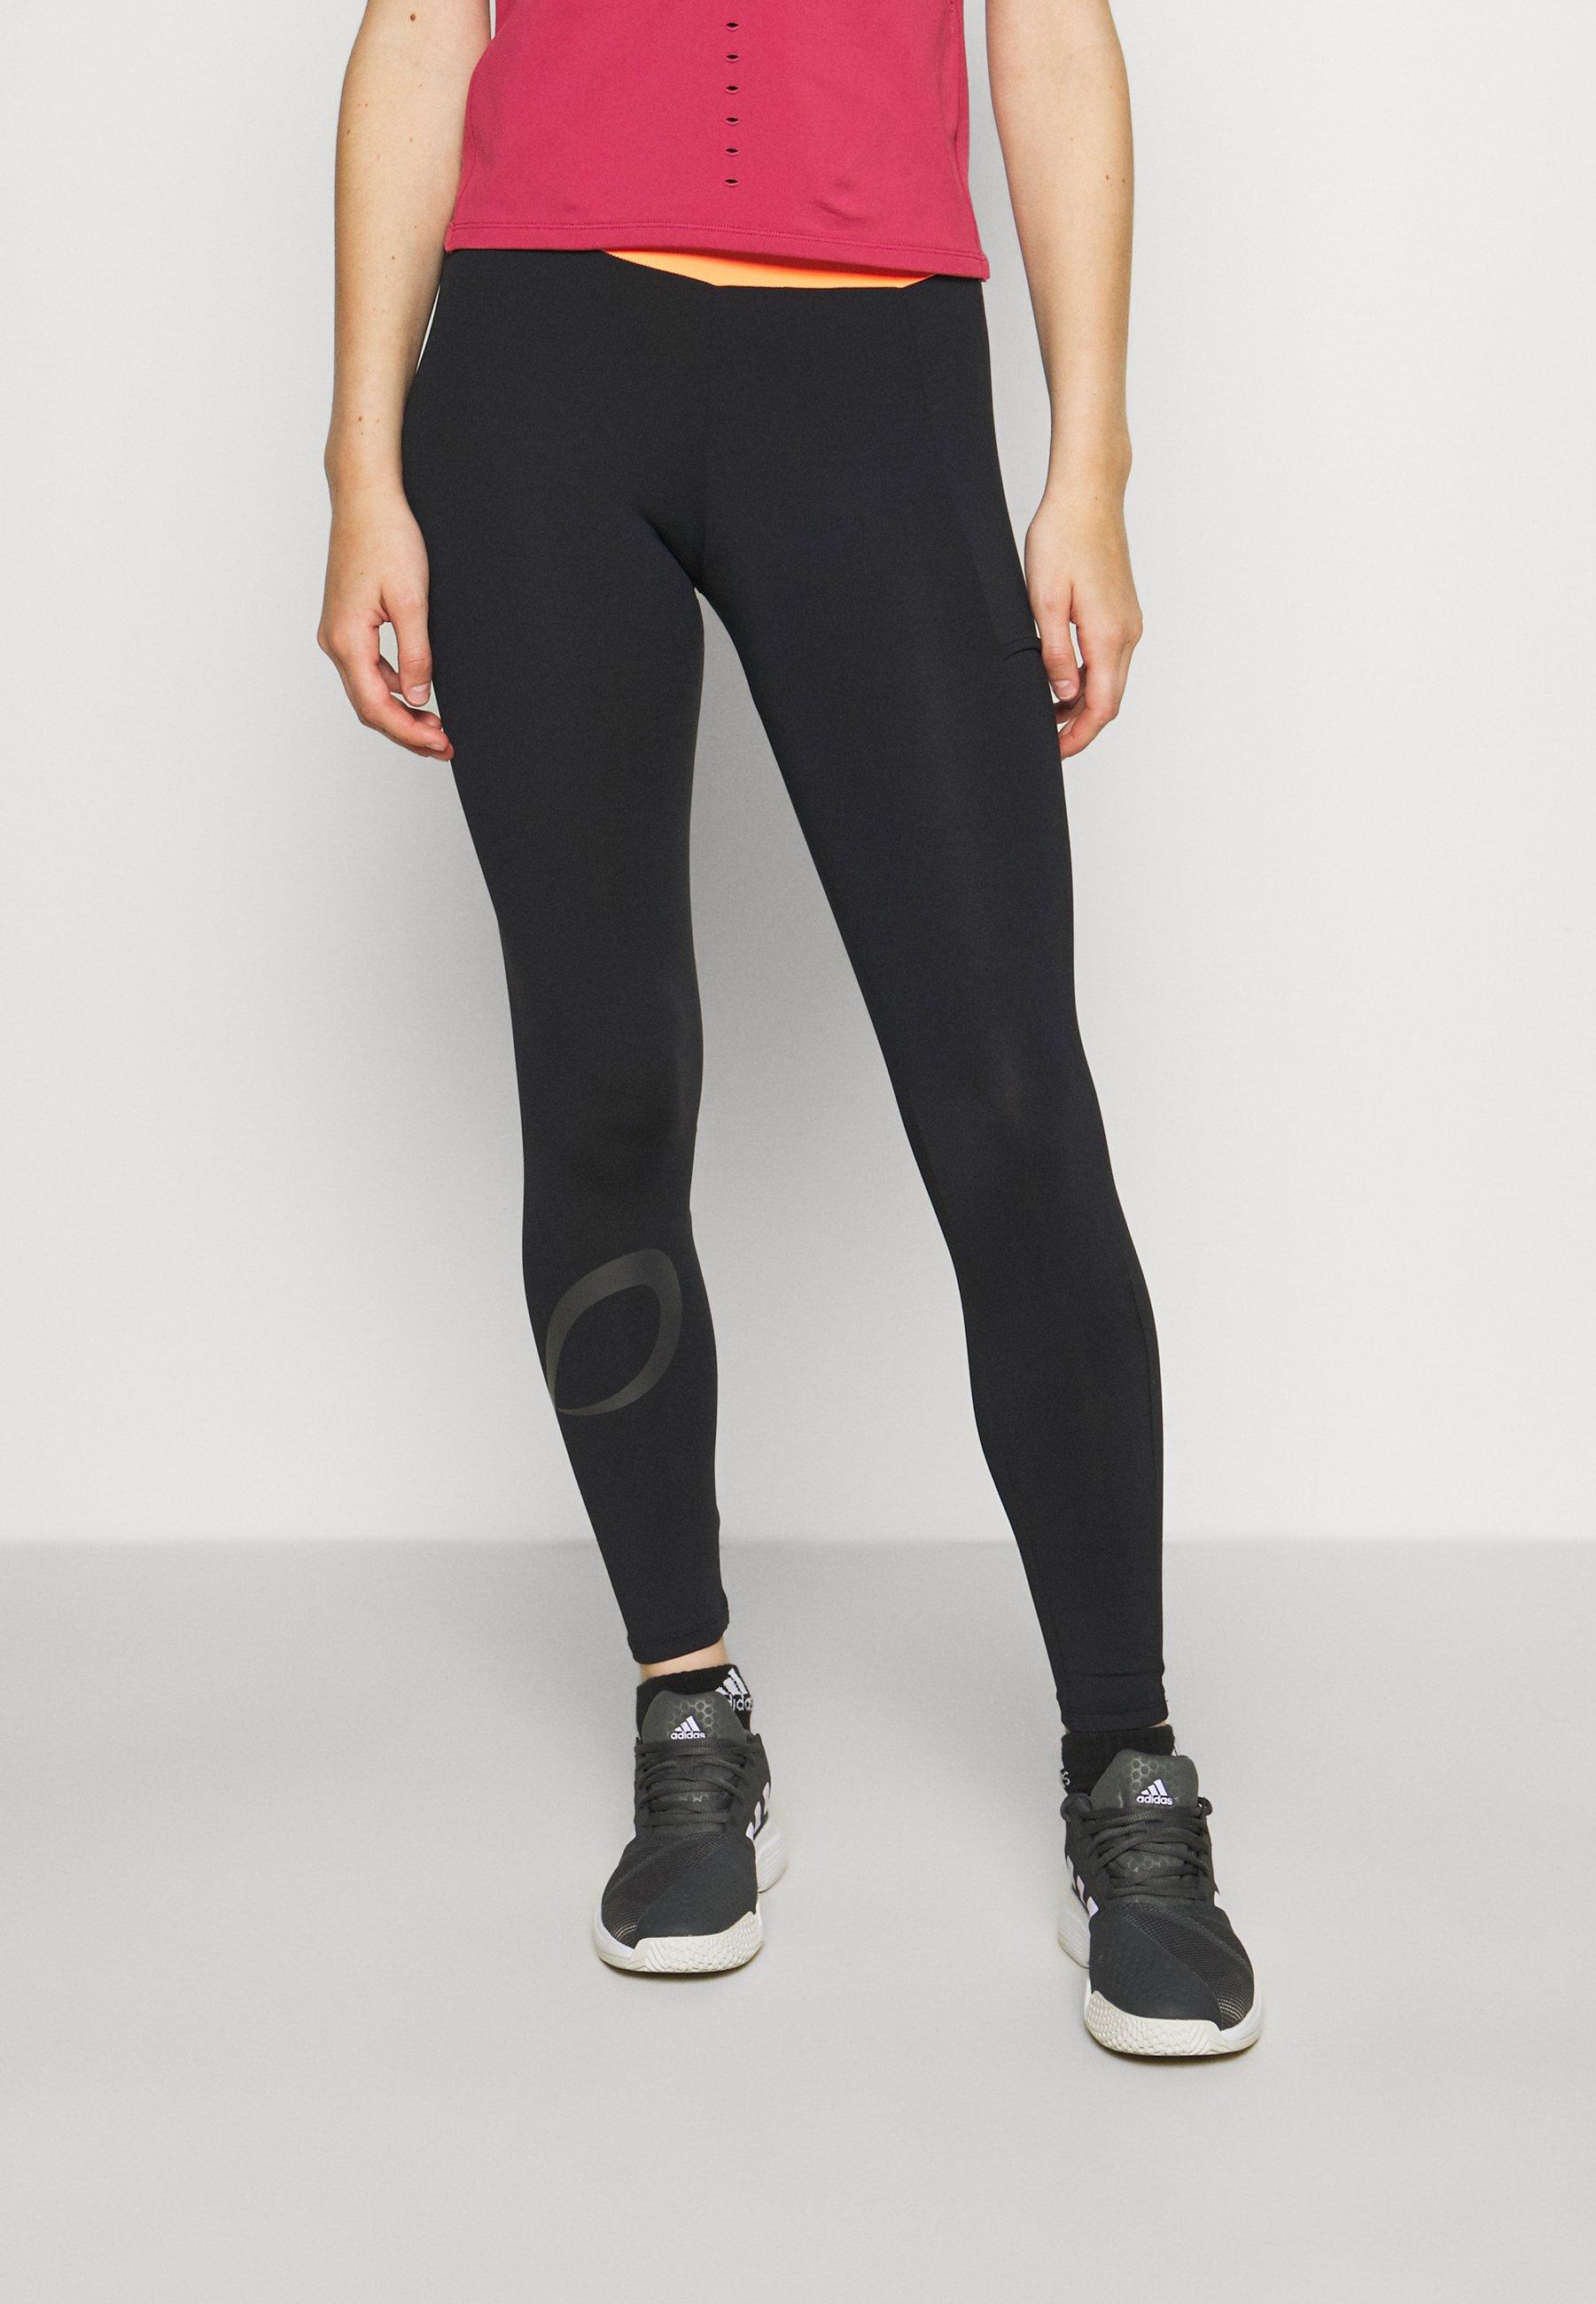 Femme MALLAS INFINITY POCKET - Collants